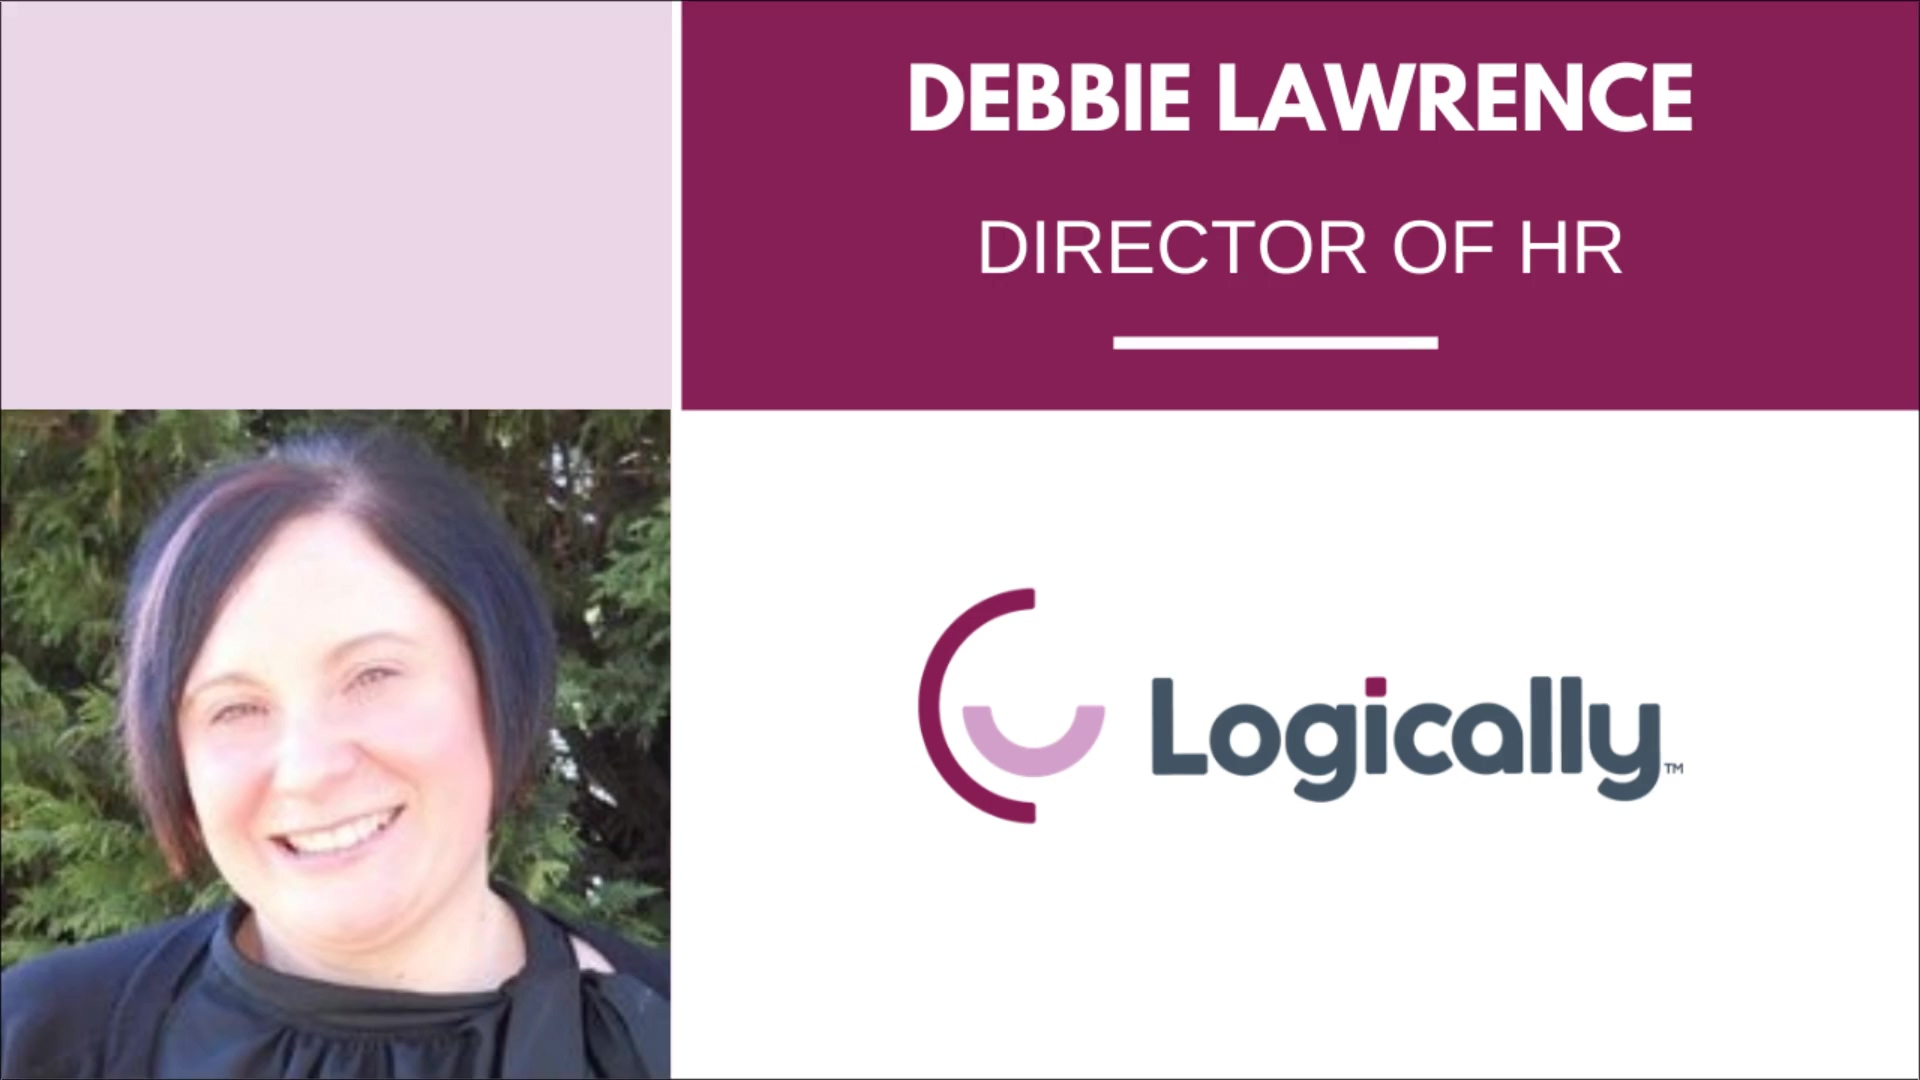 Debbie Lawrence Testimonial Draft 3 (6)